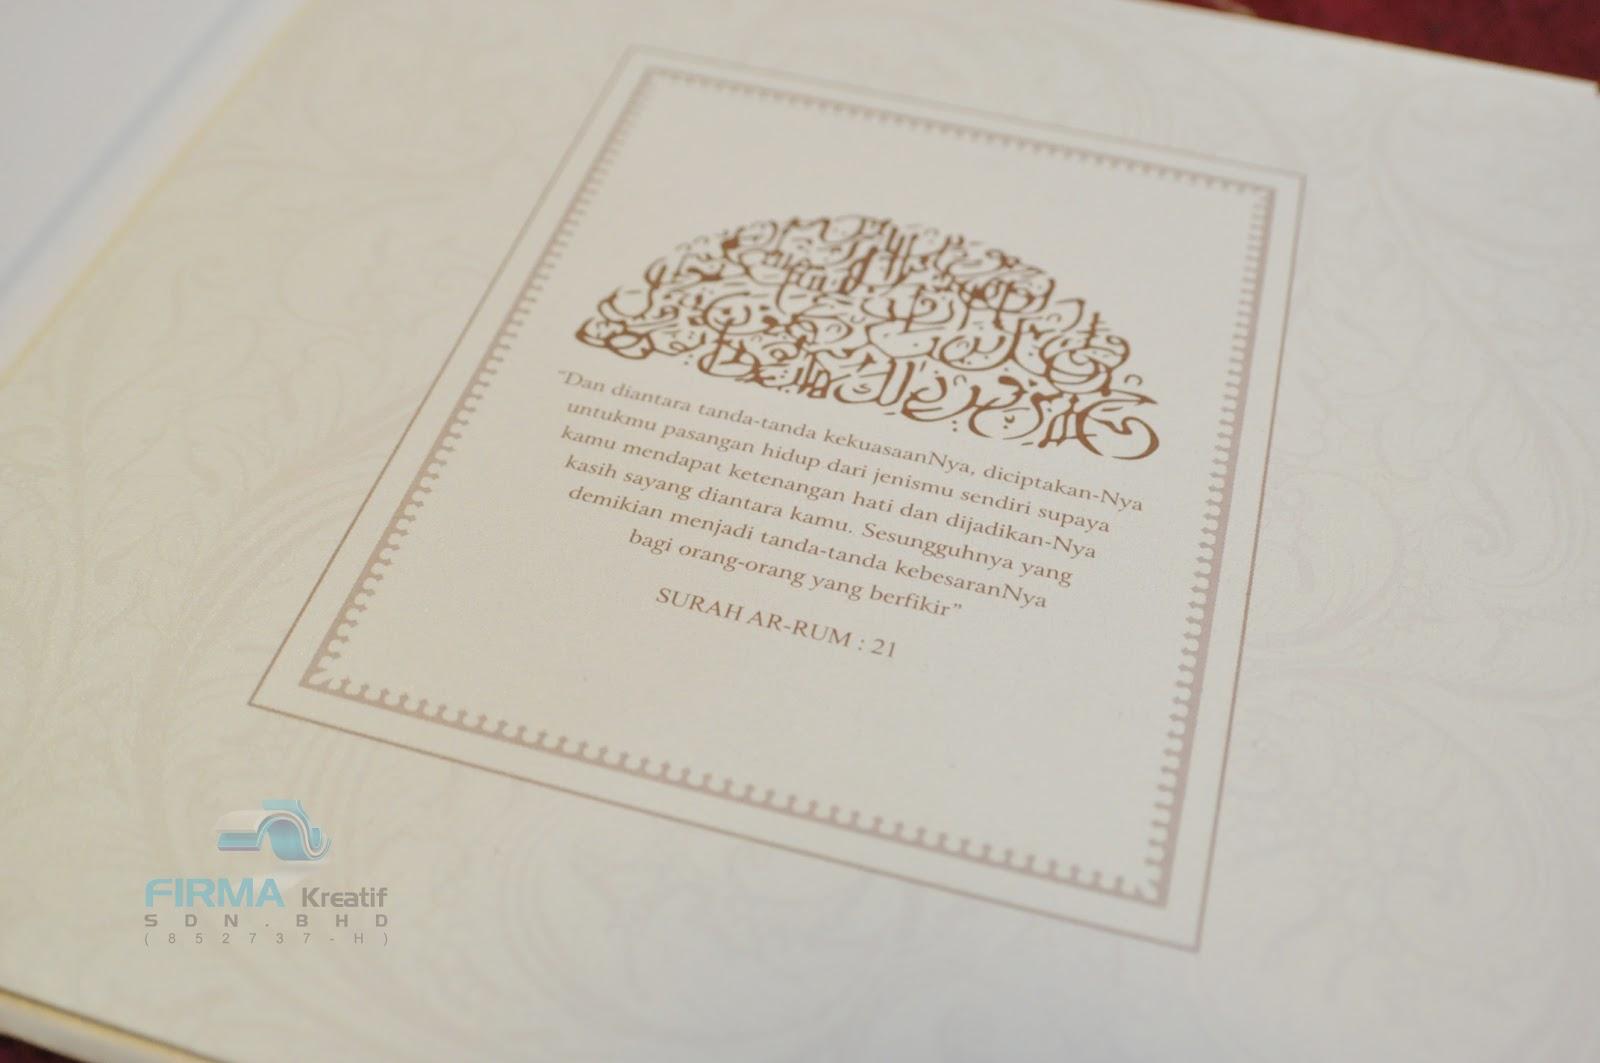 Firma kreatif sdn bhd january 2013 wedding card asri nurul stopboris Images